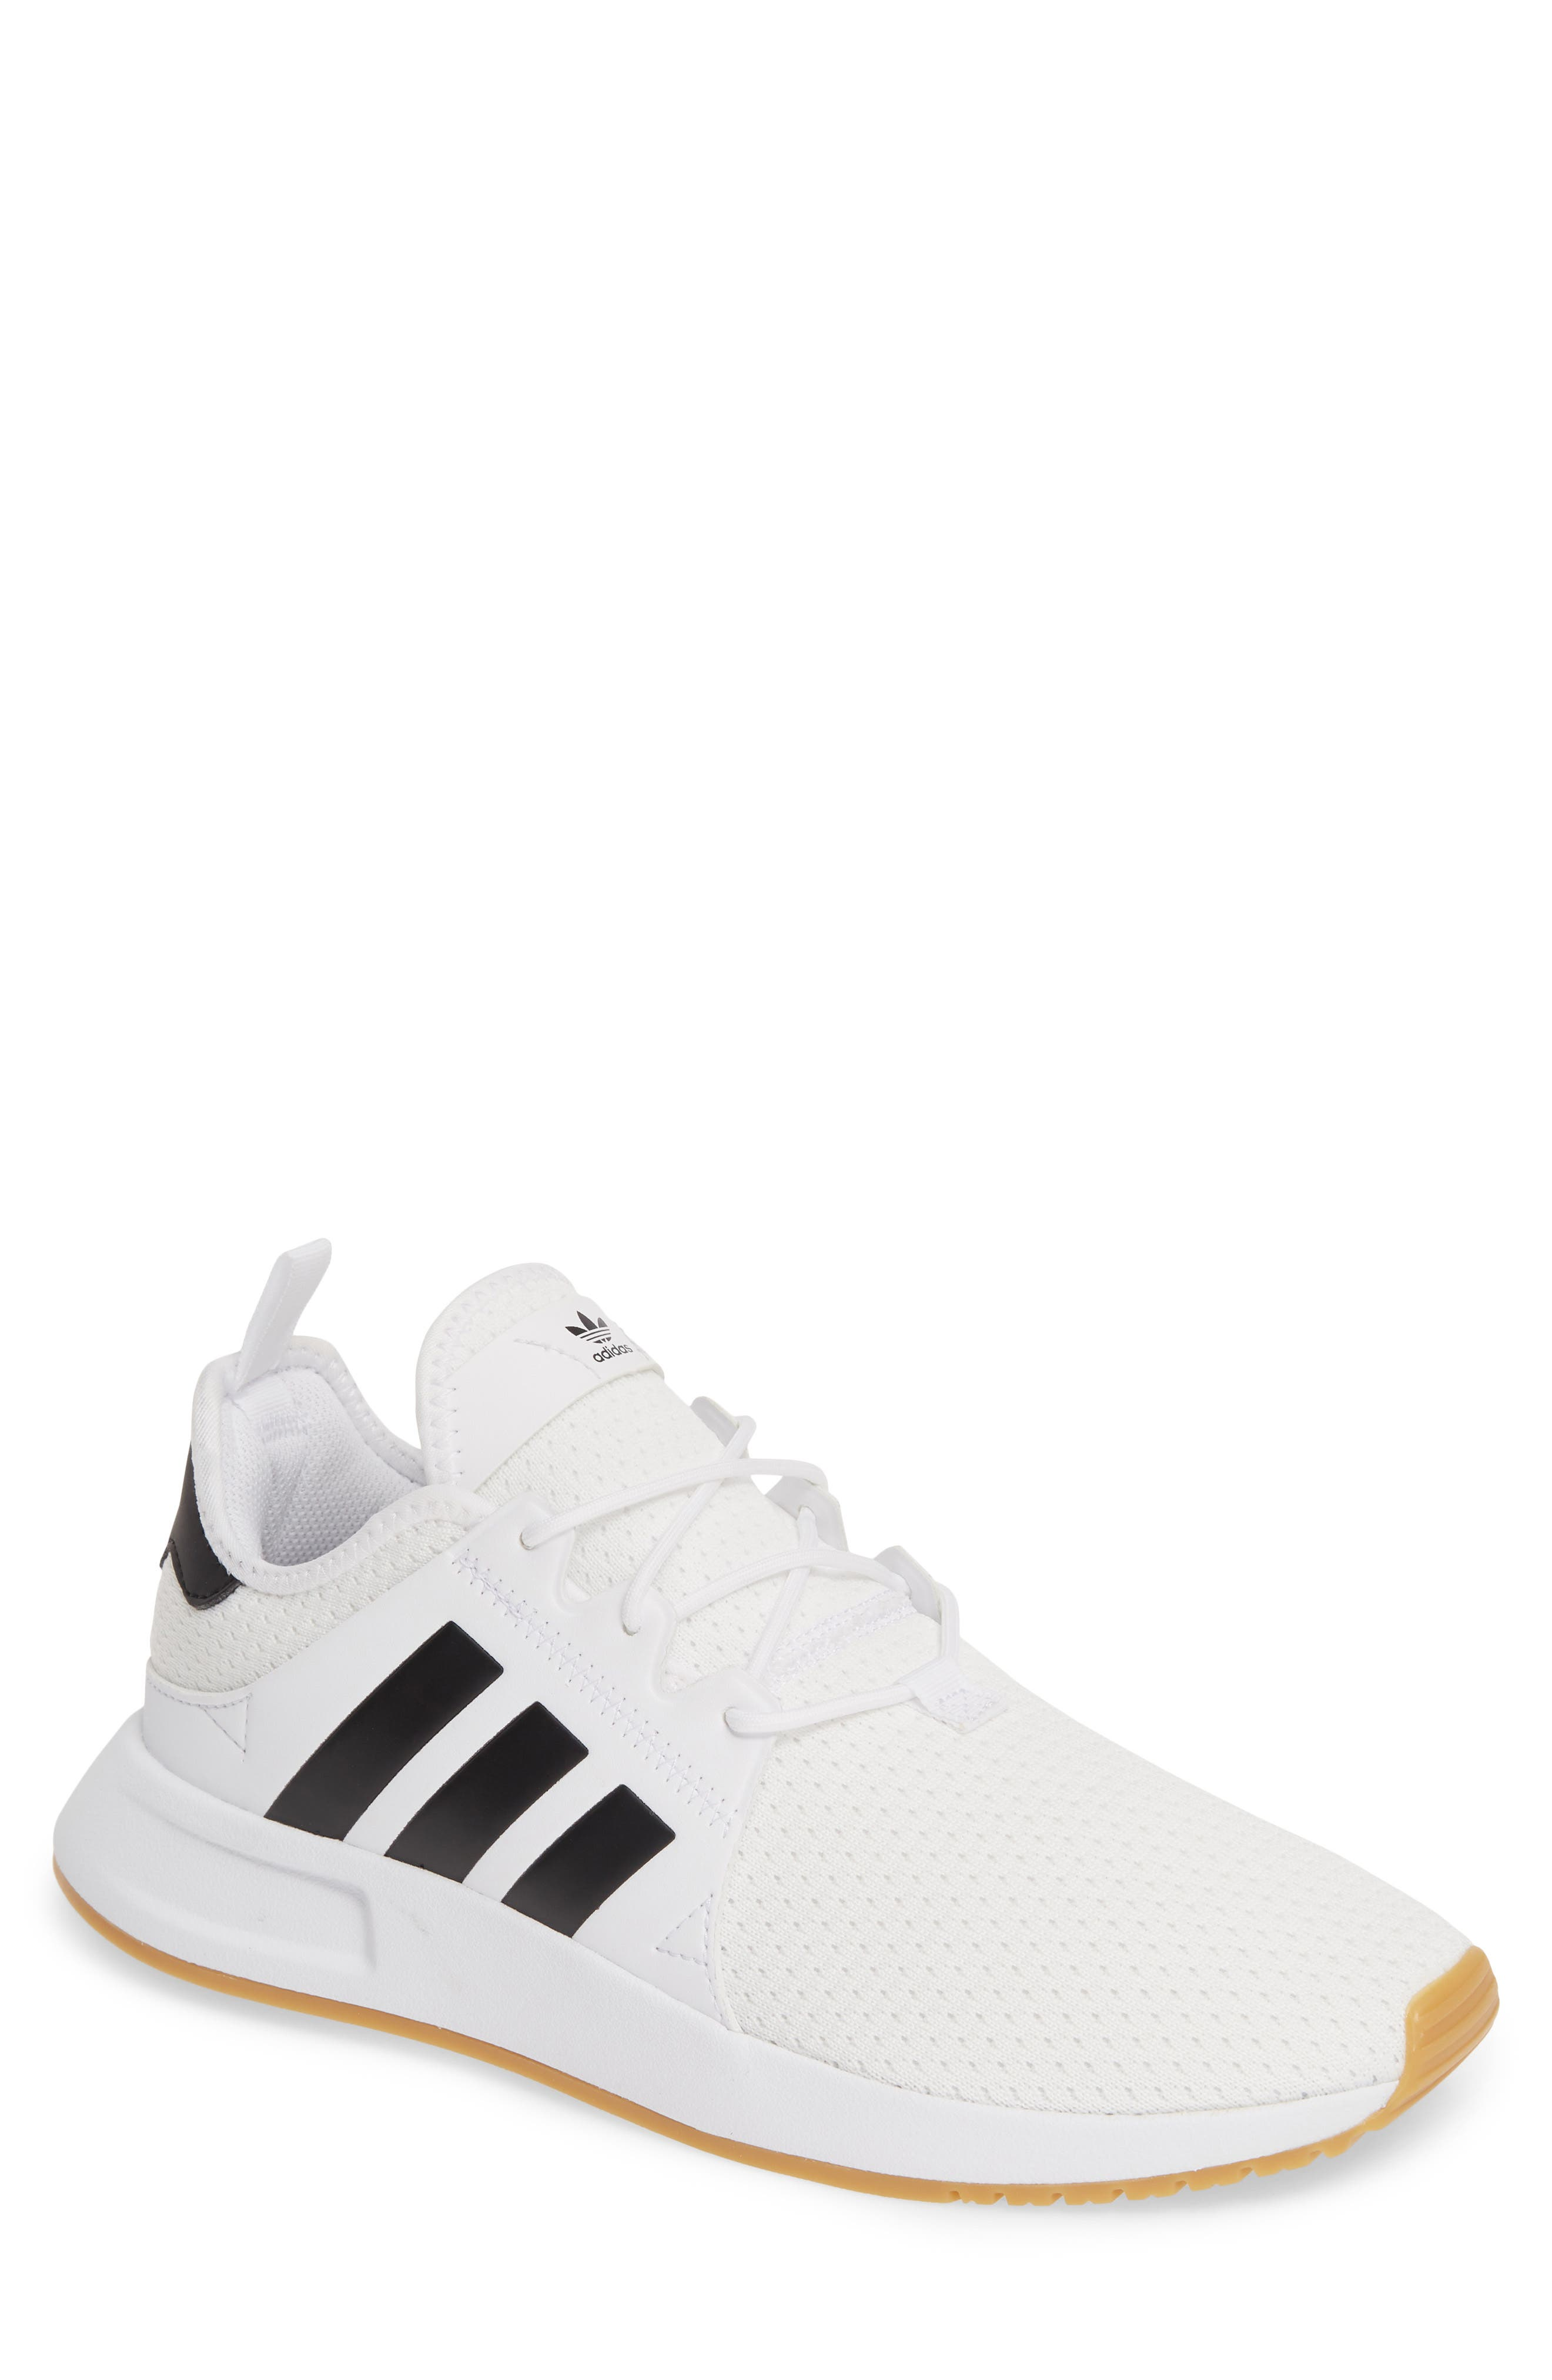 ADIDAS, X_PLR Sneaker, Main thumbnail 1, color, WHITE/ CORE BLACK/ GUM